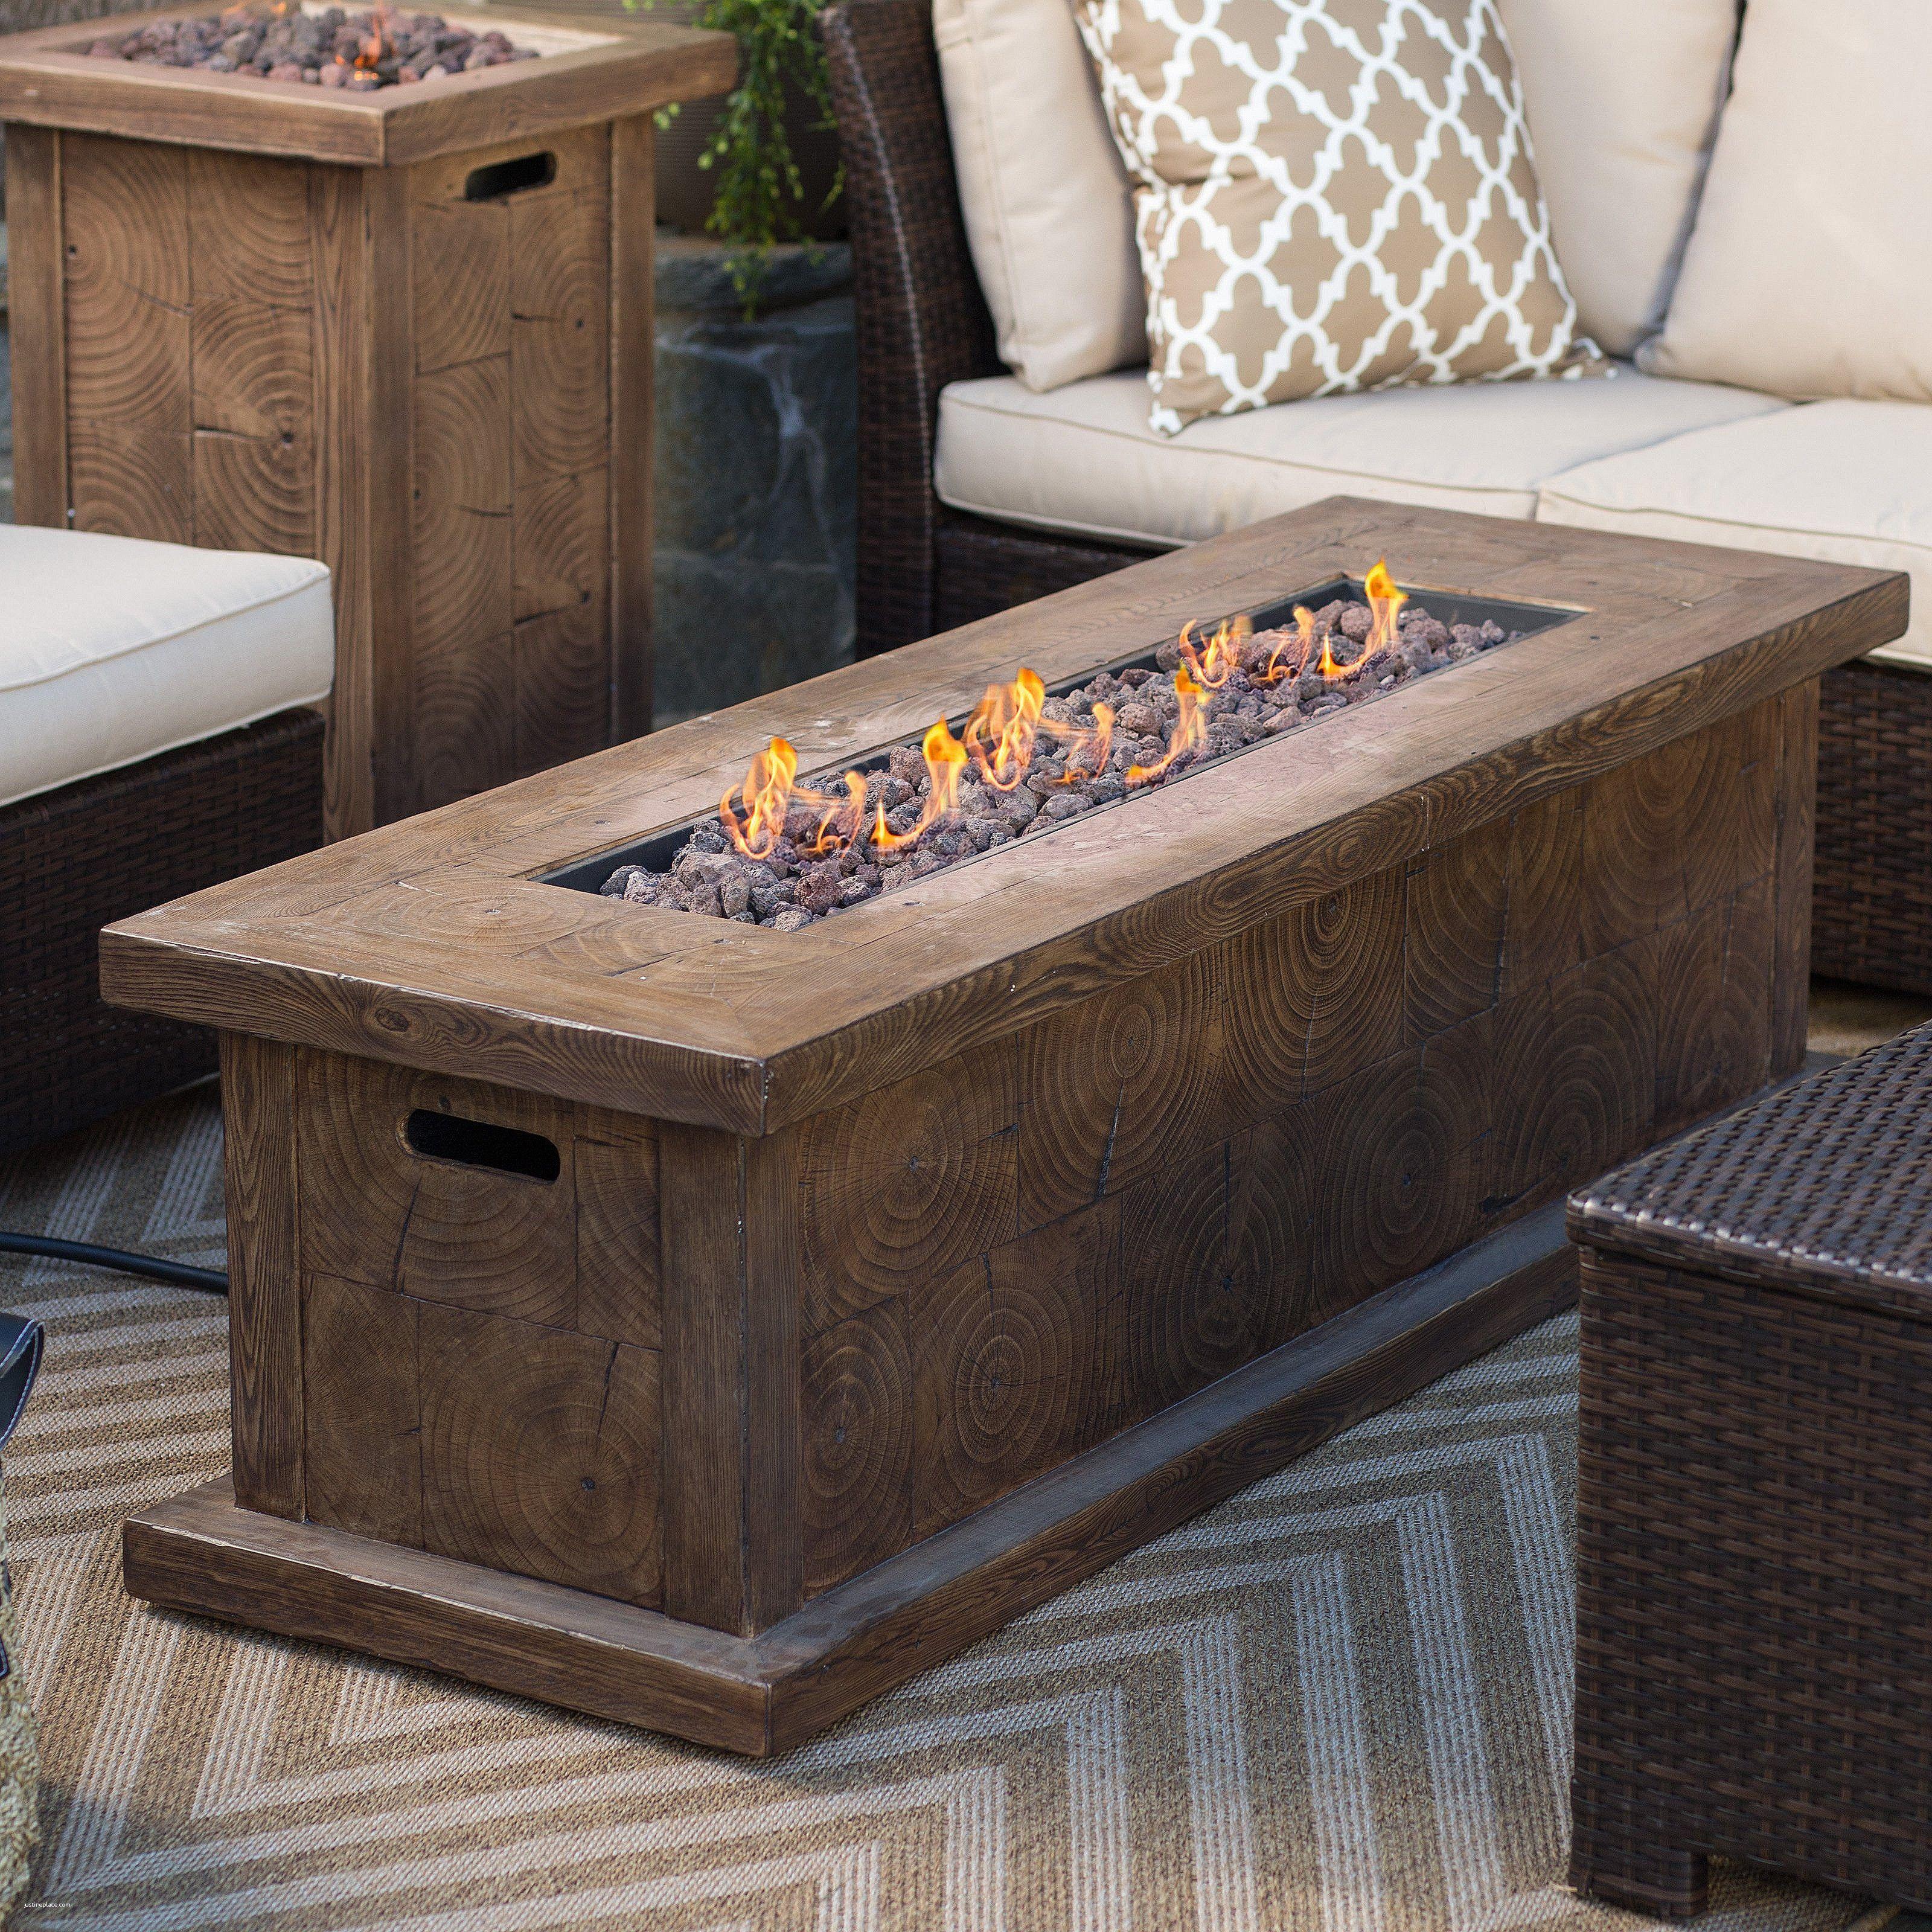 fire table diy kit